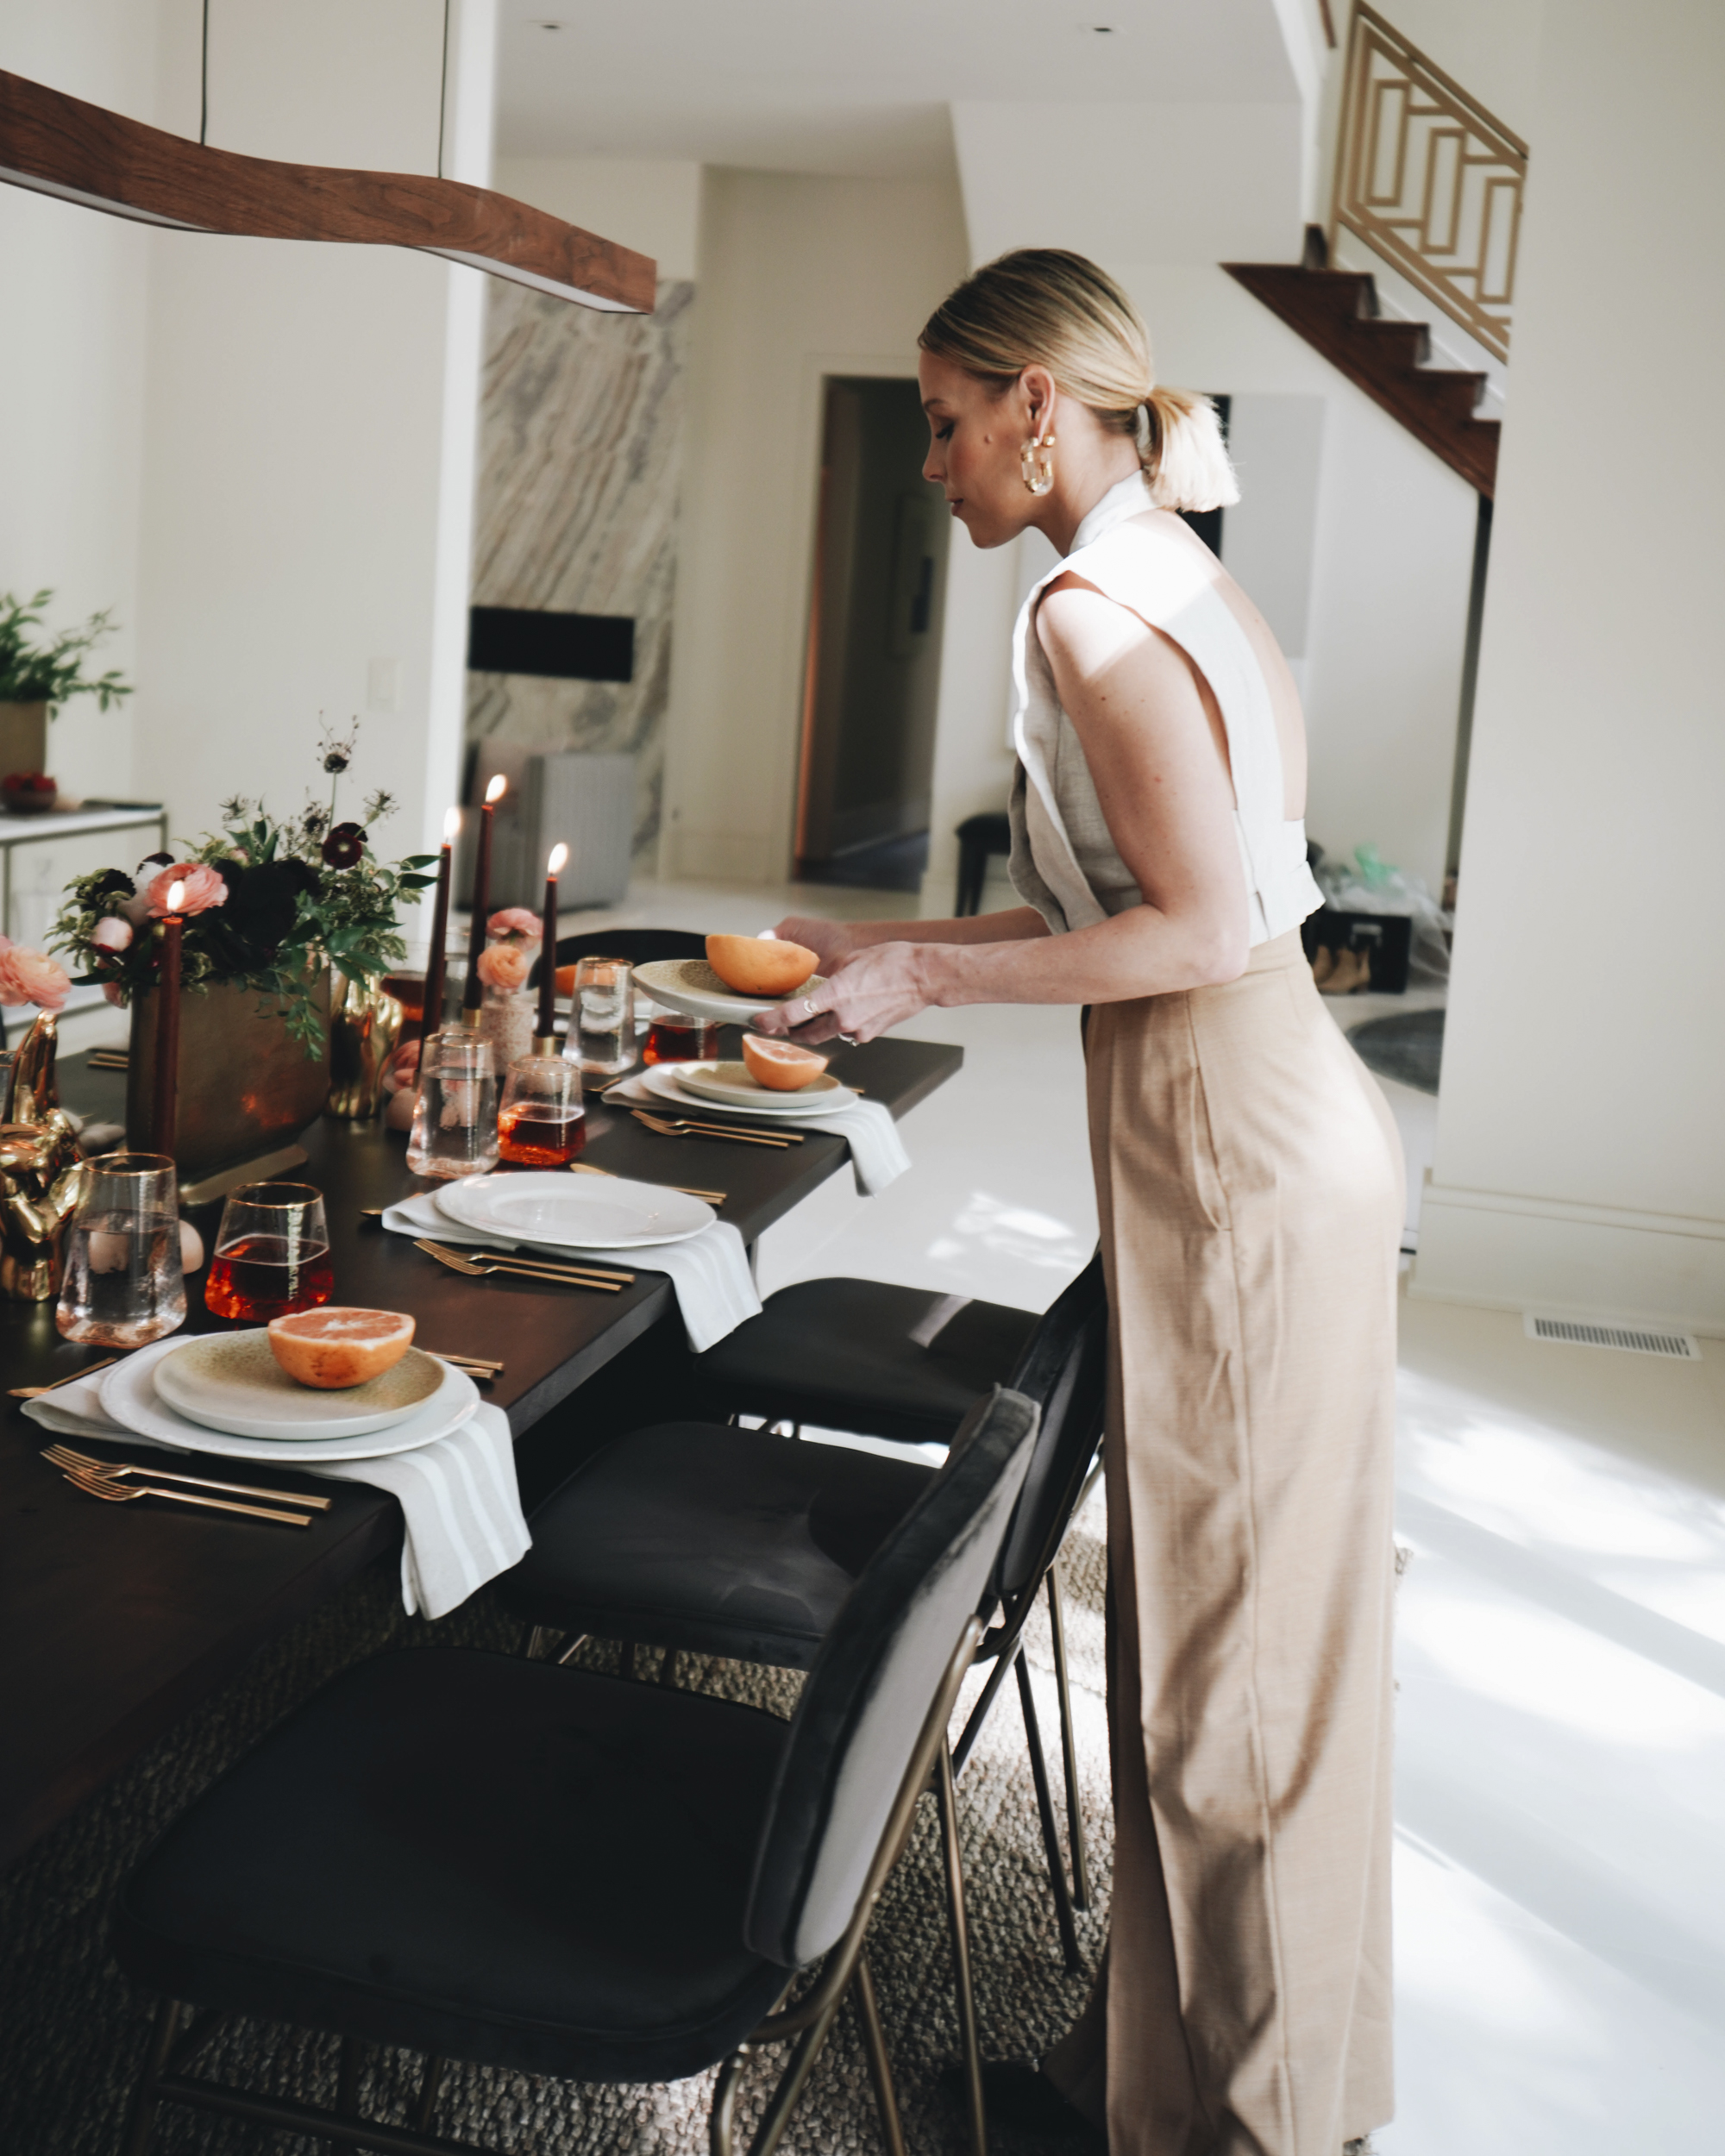 31-mayker-happily-grey-rosé-tablescape.jpg